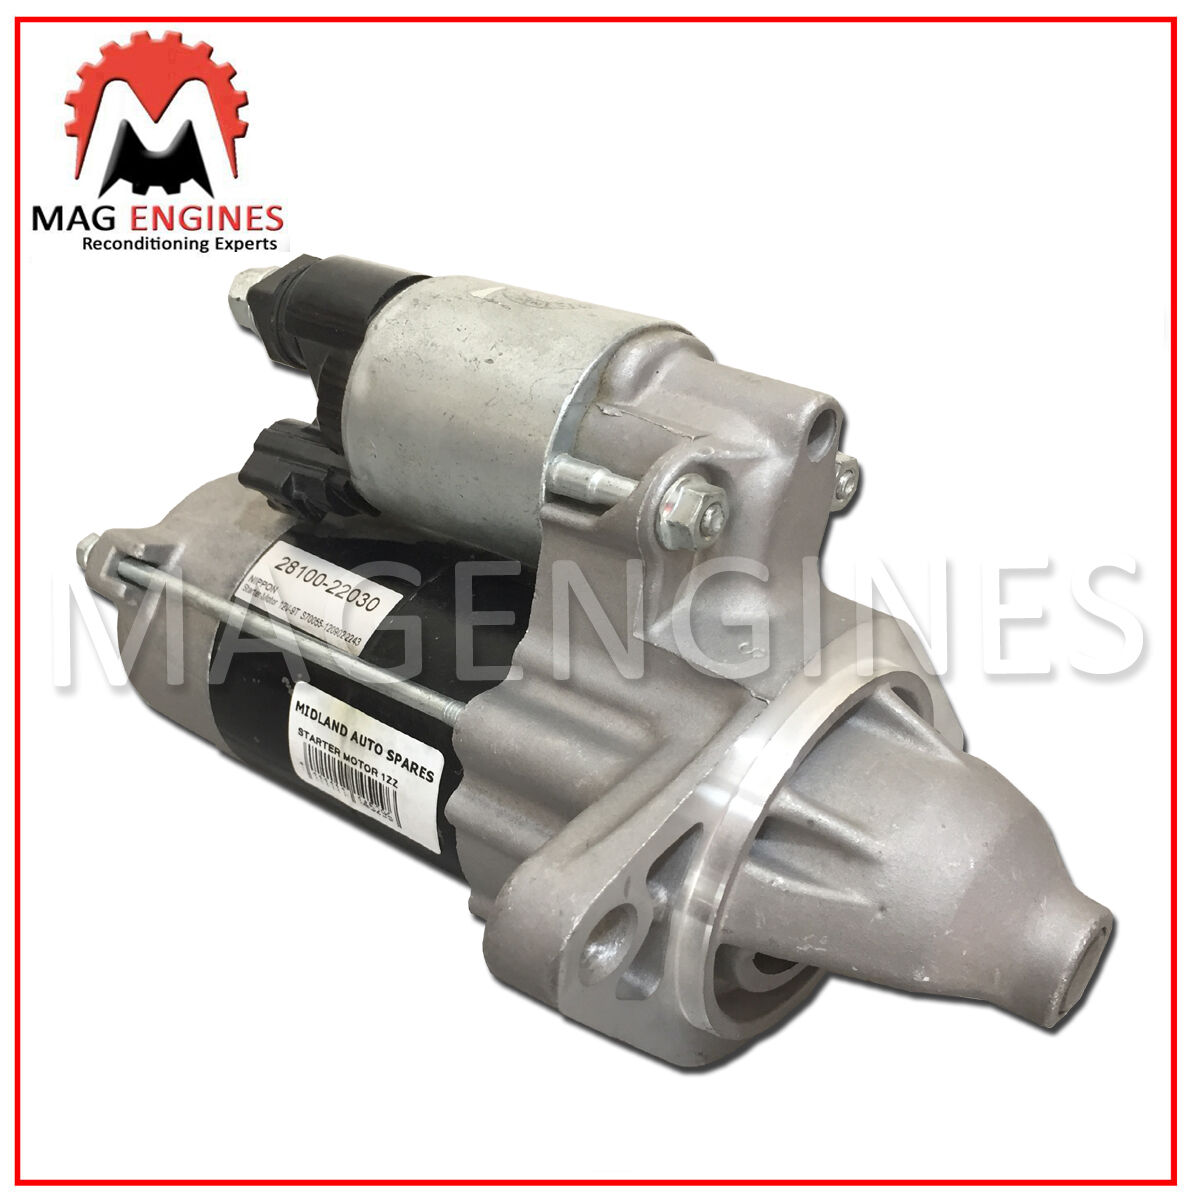 Fred Starter Motor Fits For Corolla Series 28100-22030 ZZE.1ZZ,3ZZ,42800-0680